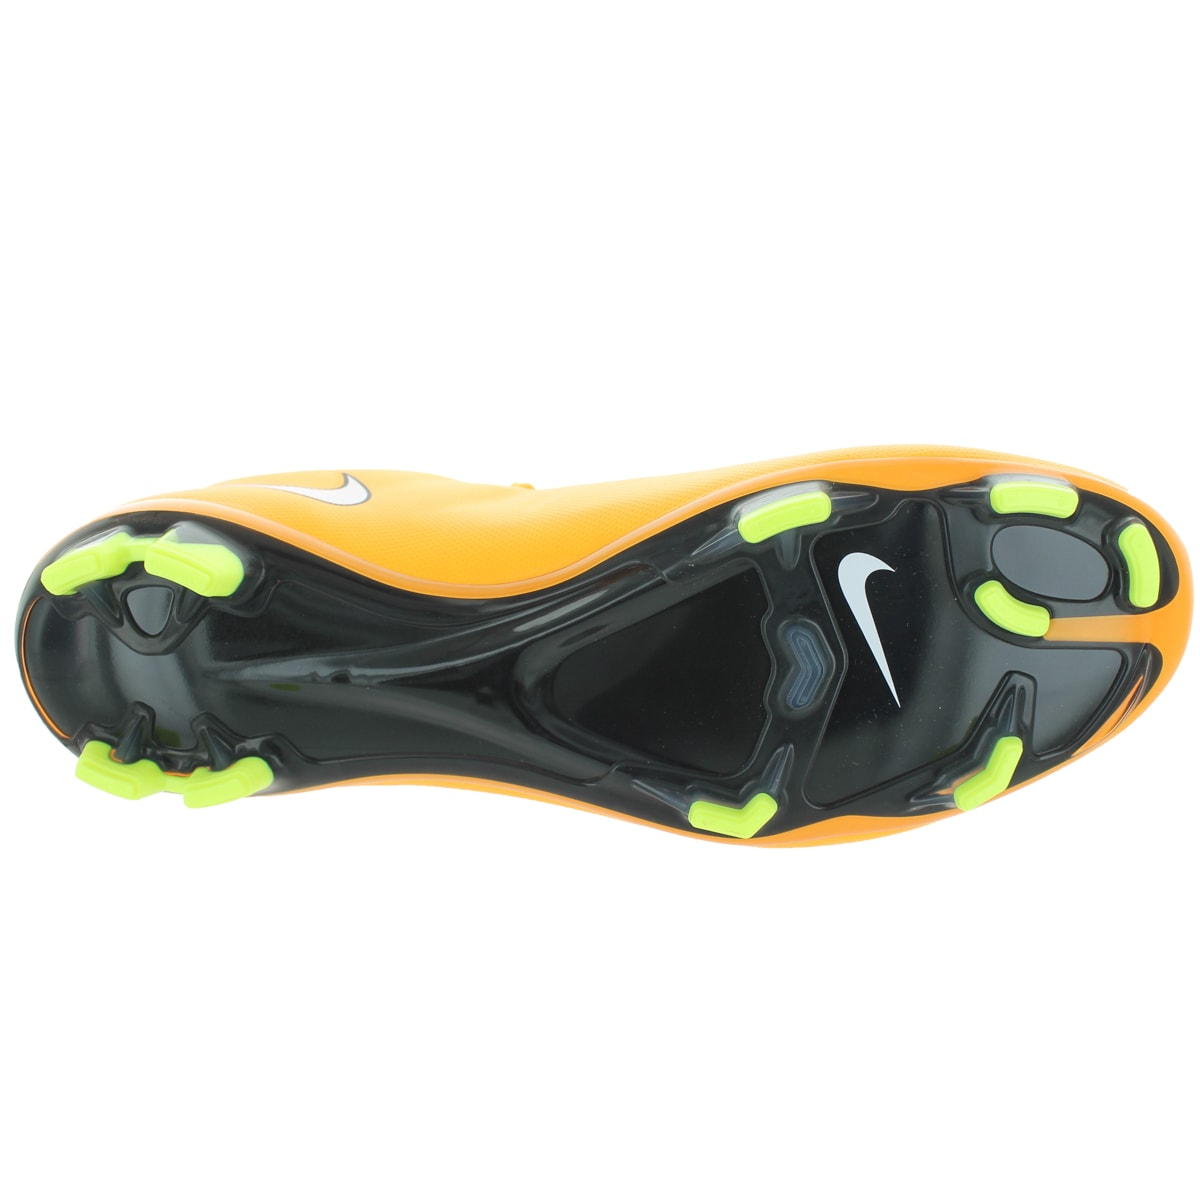 77bdd5f07c5 Shop Nike Men s Mercurial Veloce Ii Fg Laser Orange White Black Volt Soccer  Cleat - Free Shipping Today - Overstock - 12330802